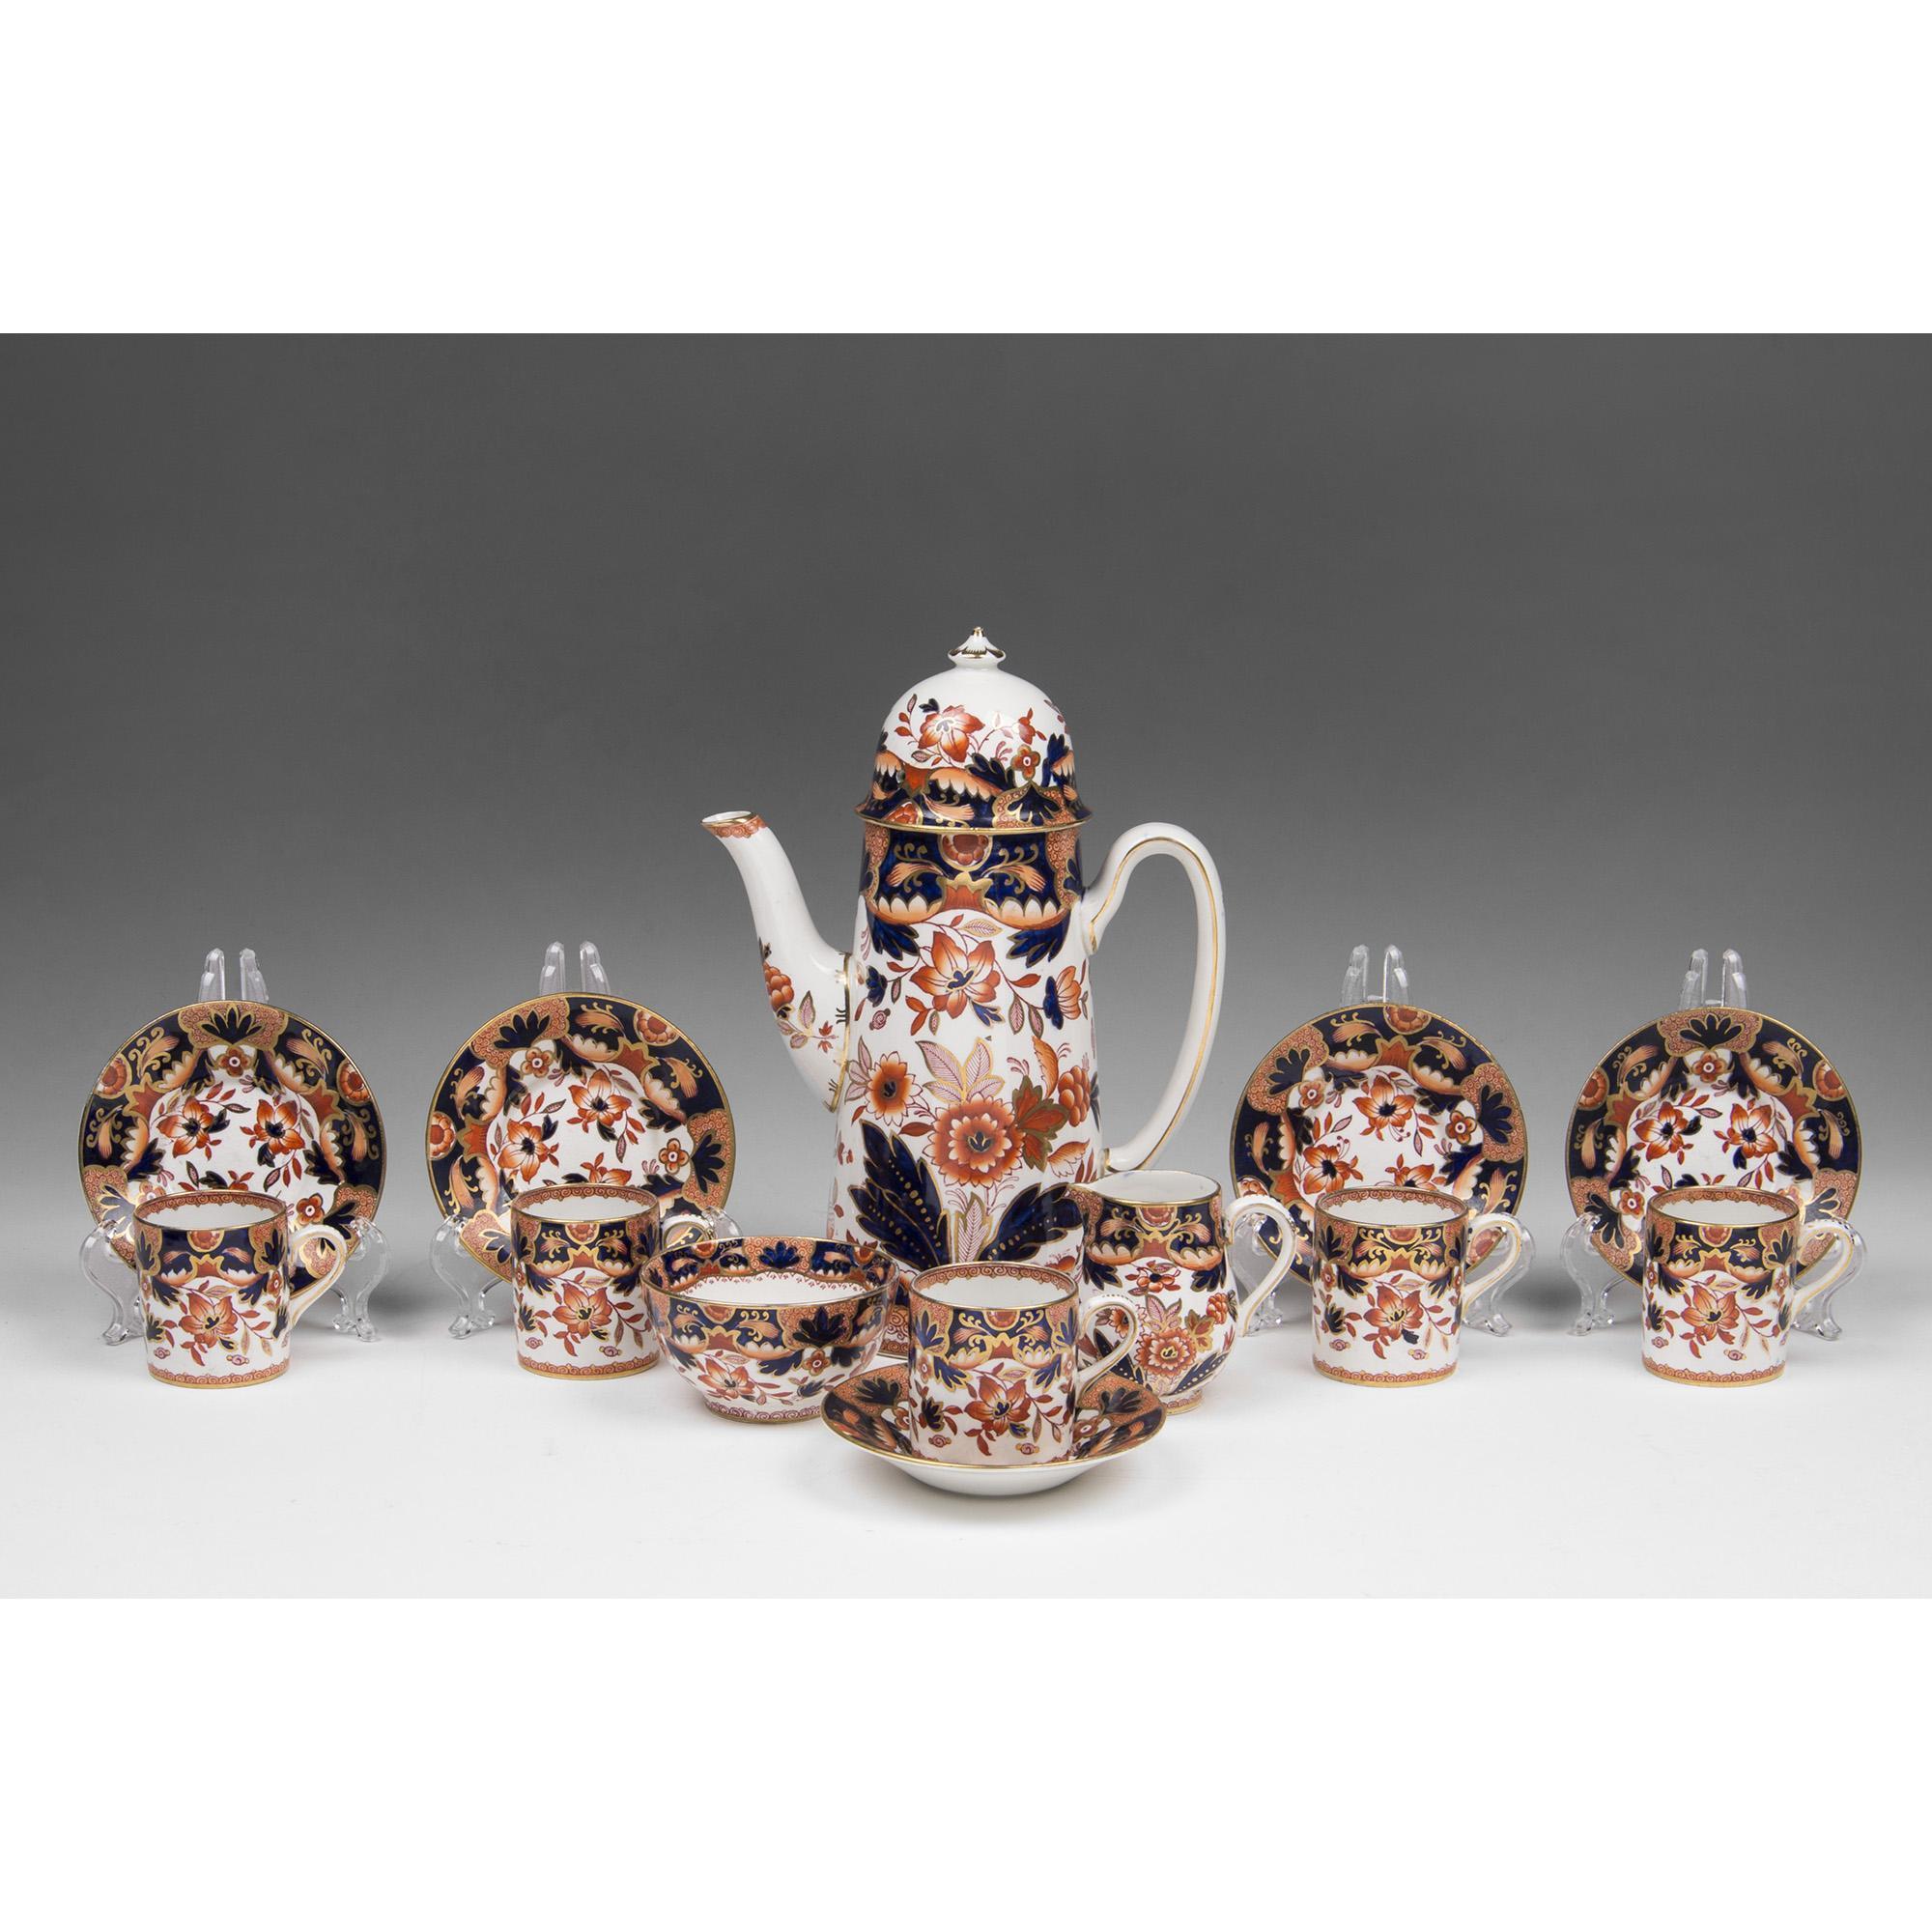 "Booth's China Tea Set, ""Rajah"" Pattern, 13 Pcs."